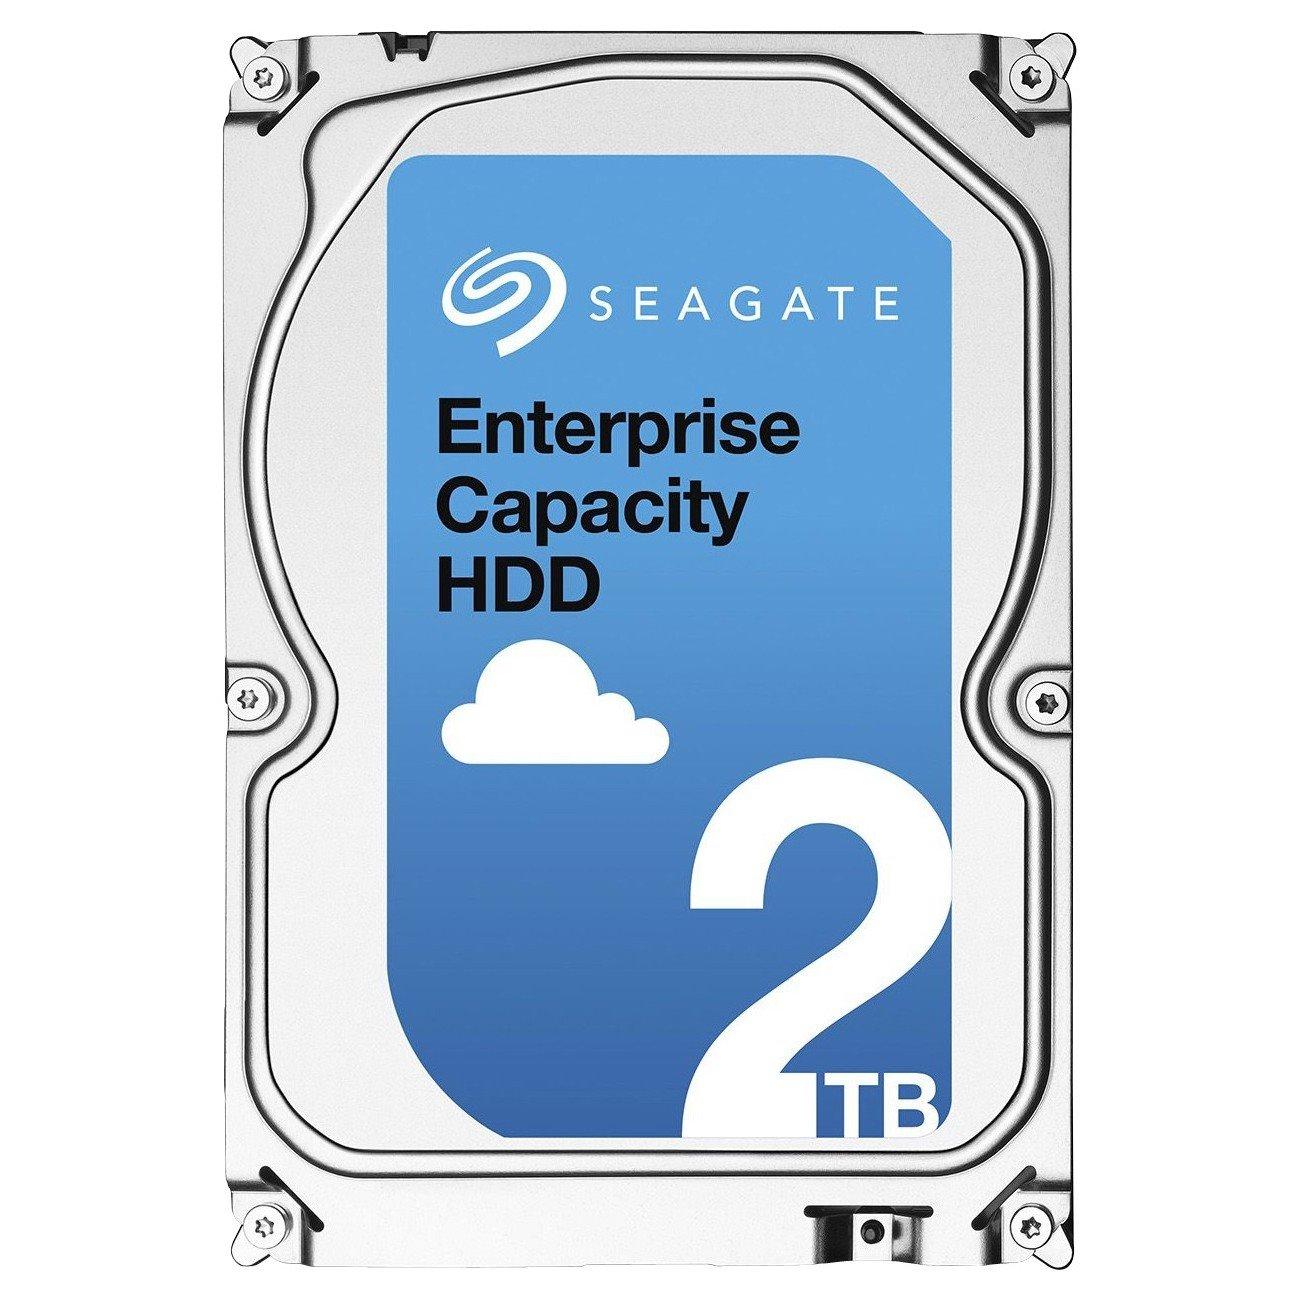 "Seagate 2 TB Hard Drive - SAS - 3.5"" Drive - Internal"